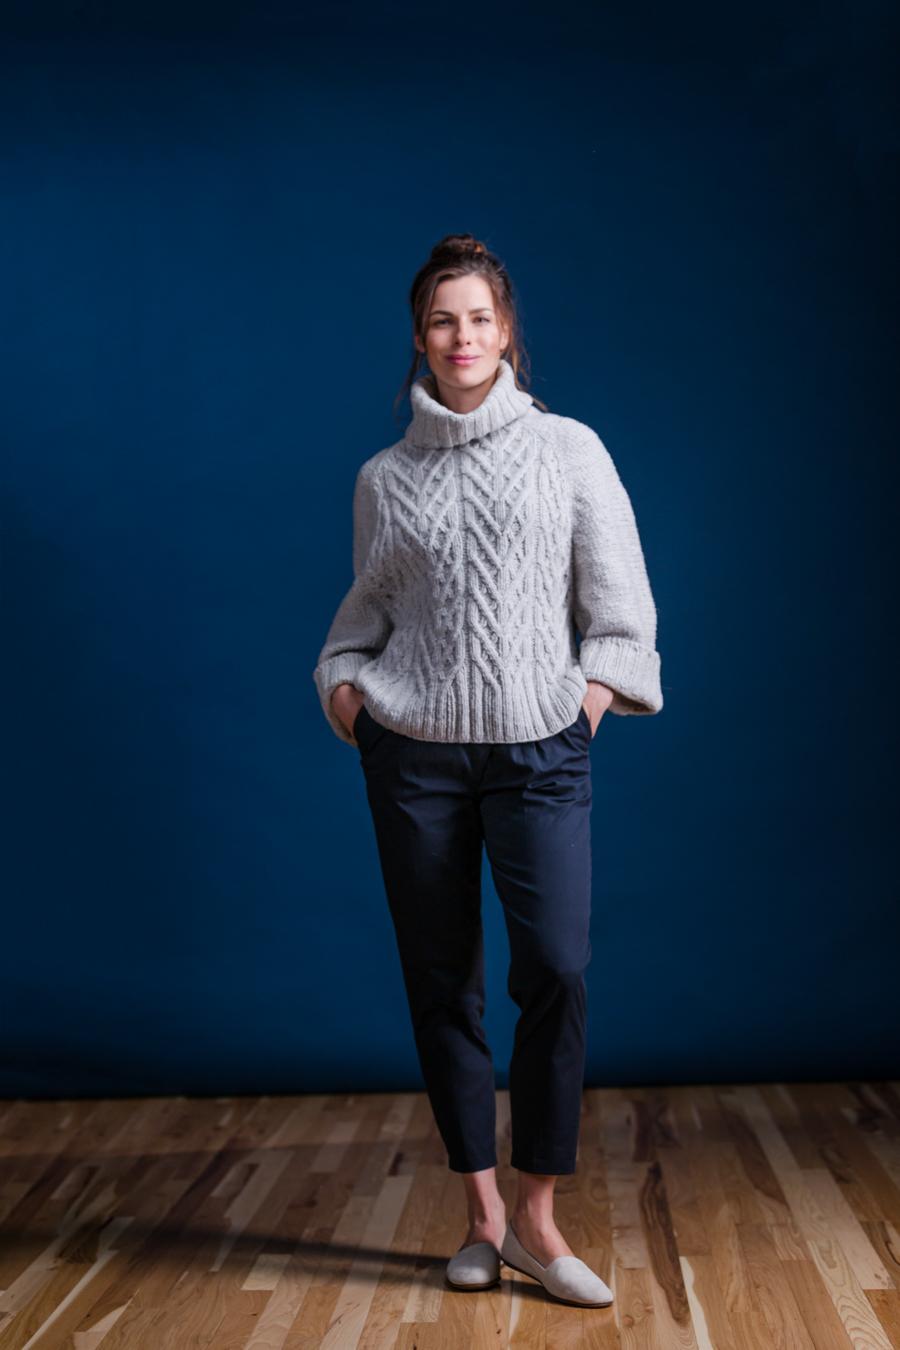 Auster - Brooklyn Tweed Fall 2016 | Shortrounds Knitwear